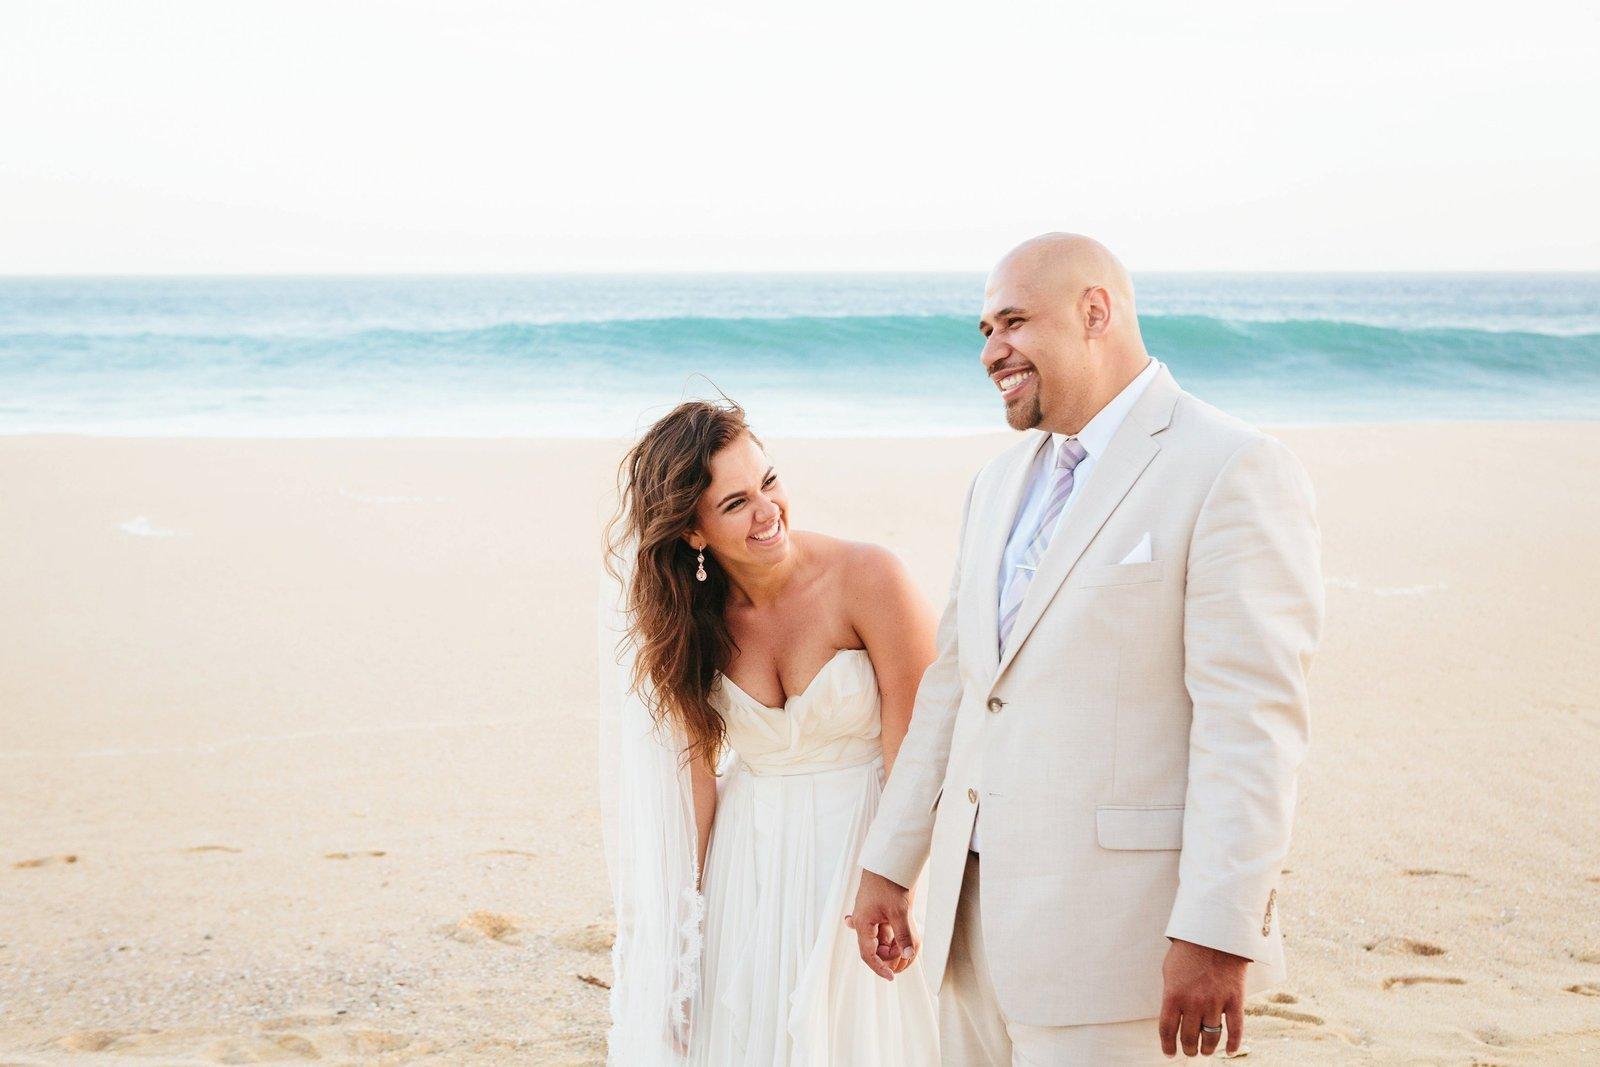 Wedding Photos-Jodee Debes Photography-160